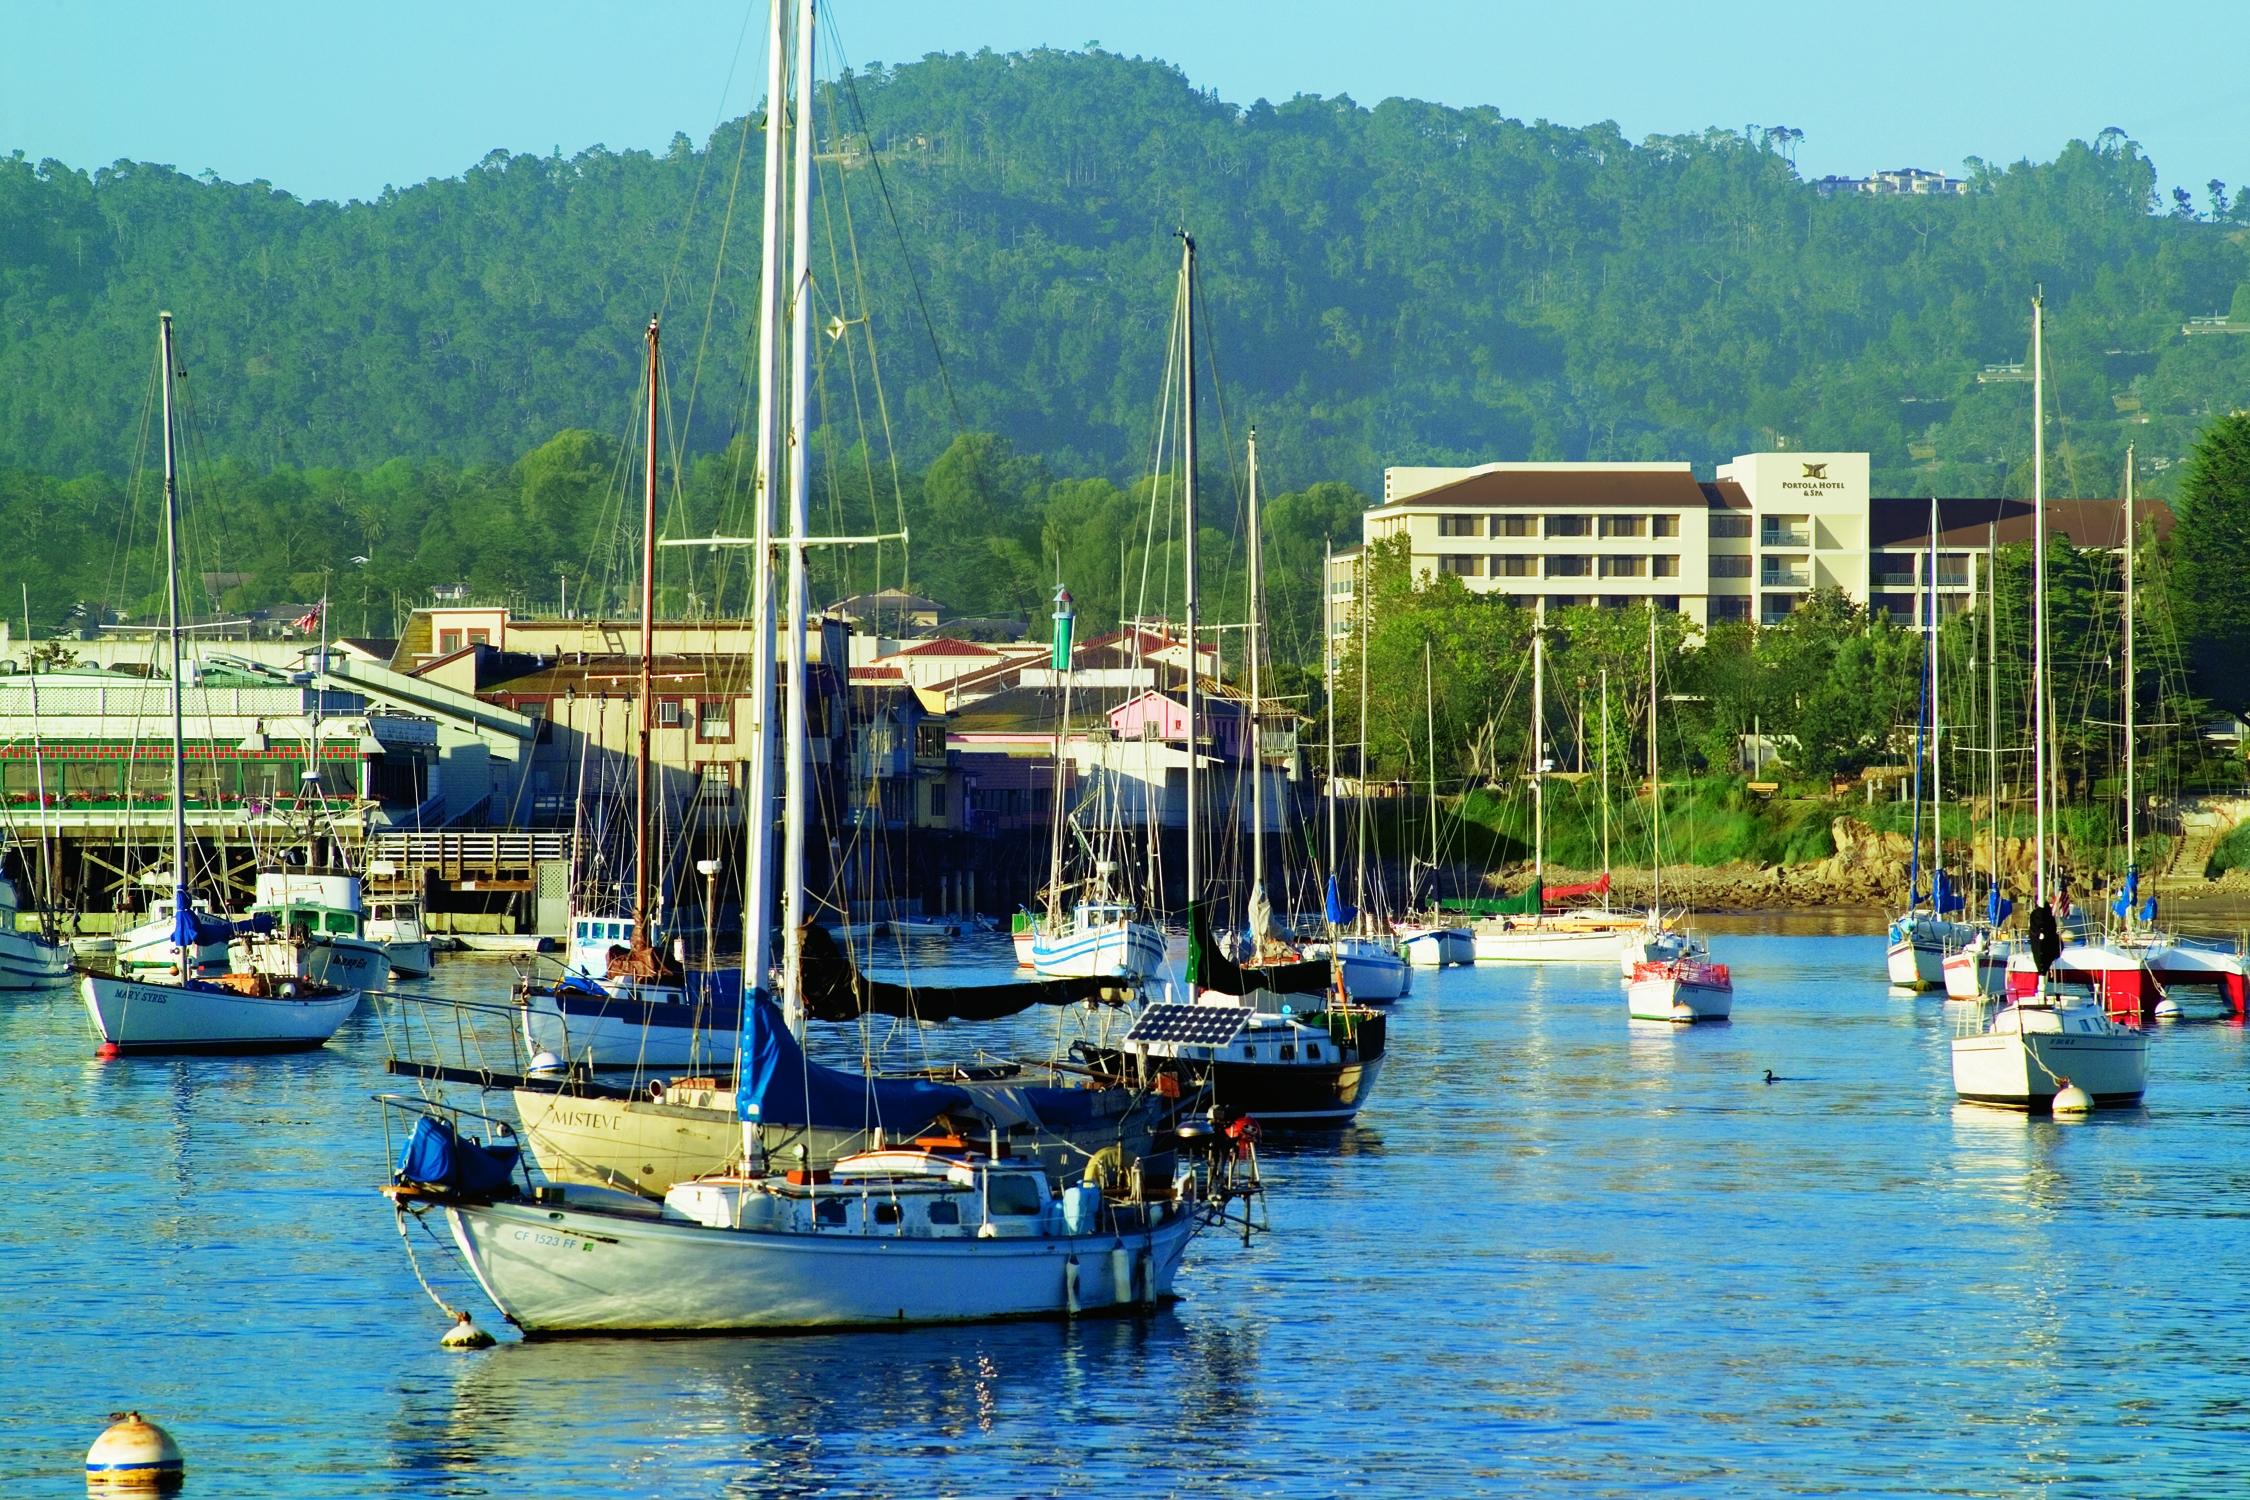 Portola Hotel & Spa at Monterey Bay image 6